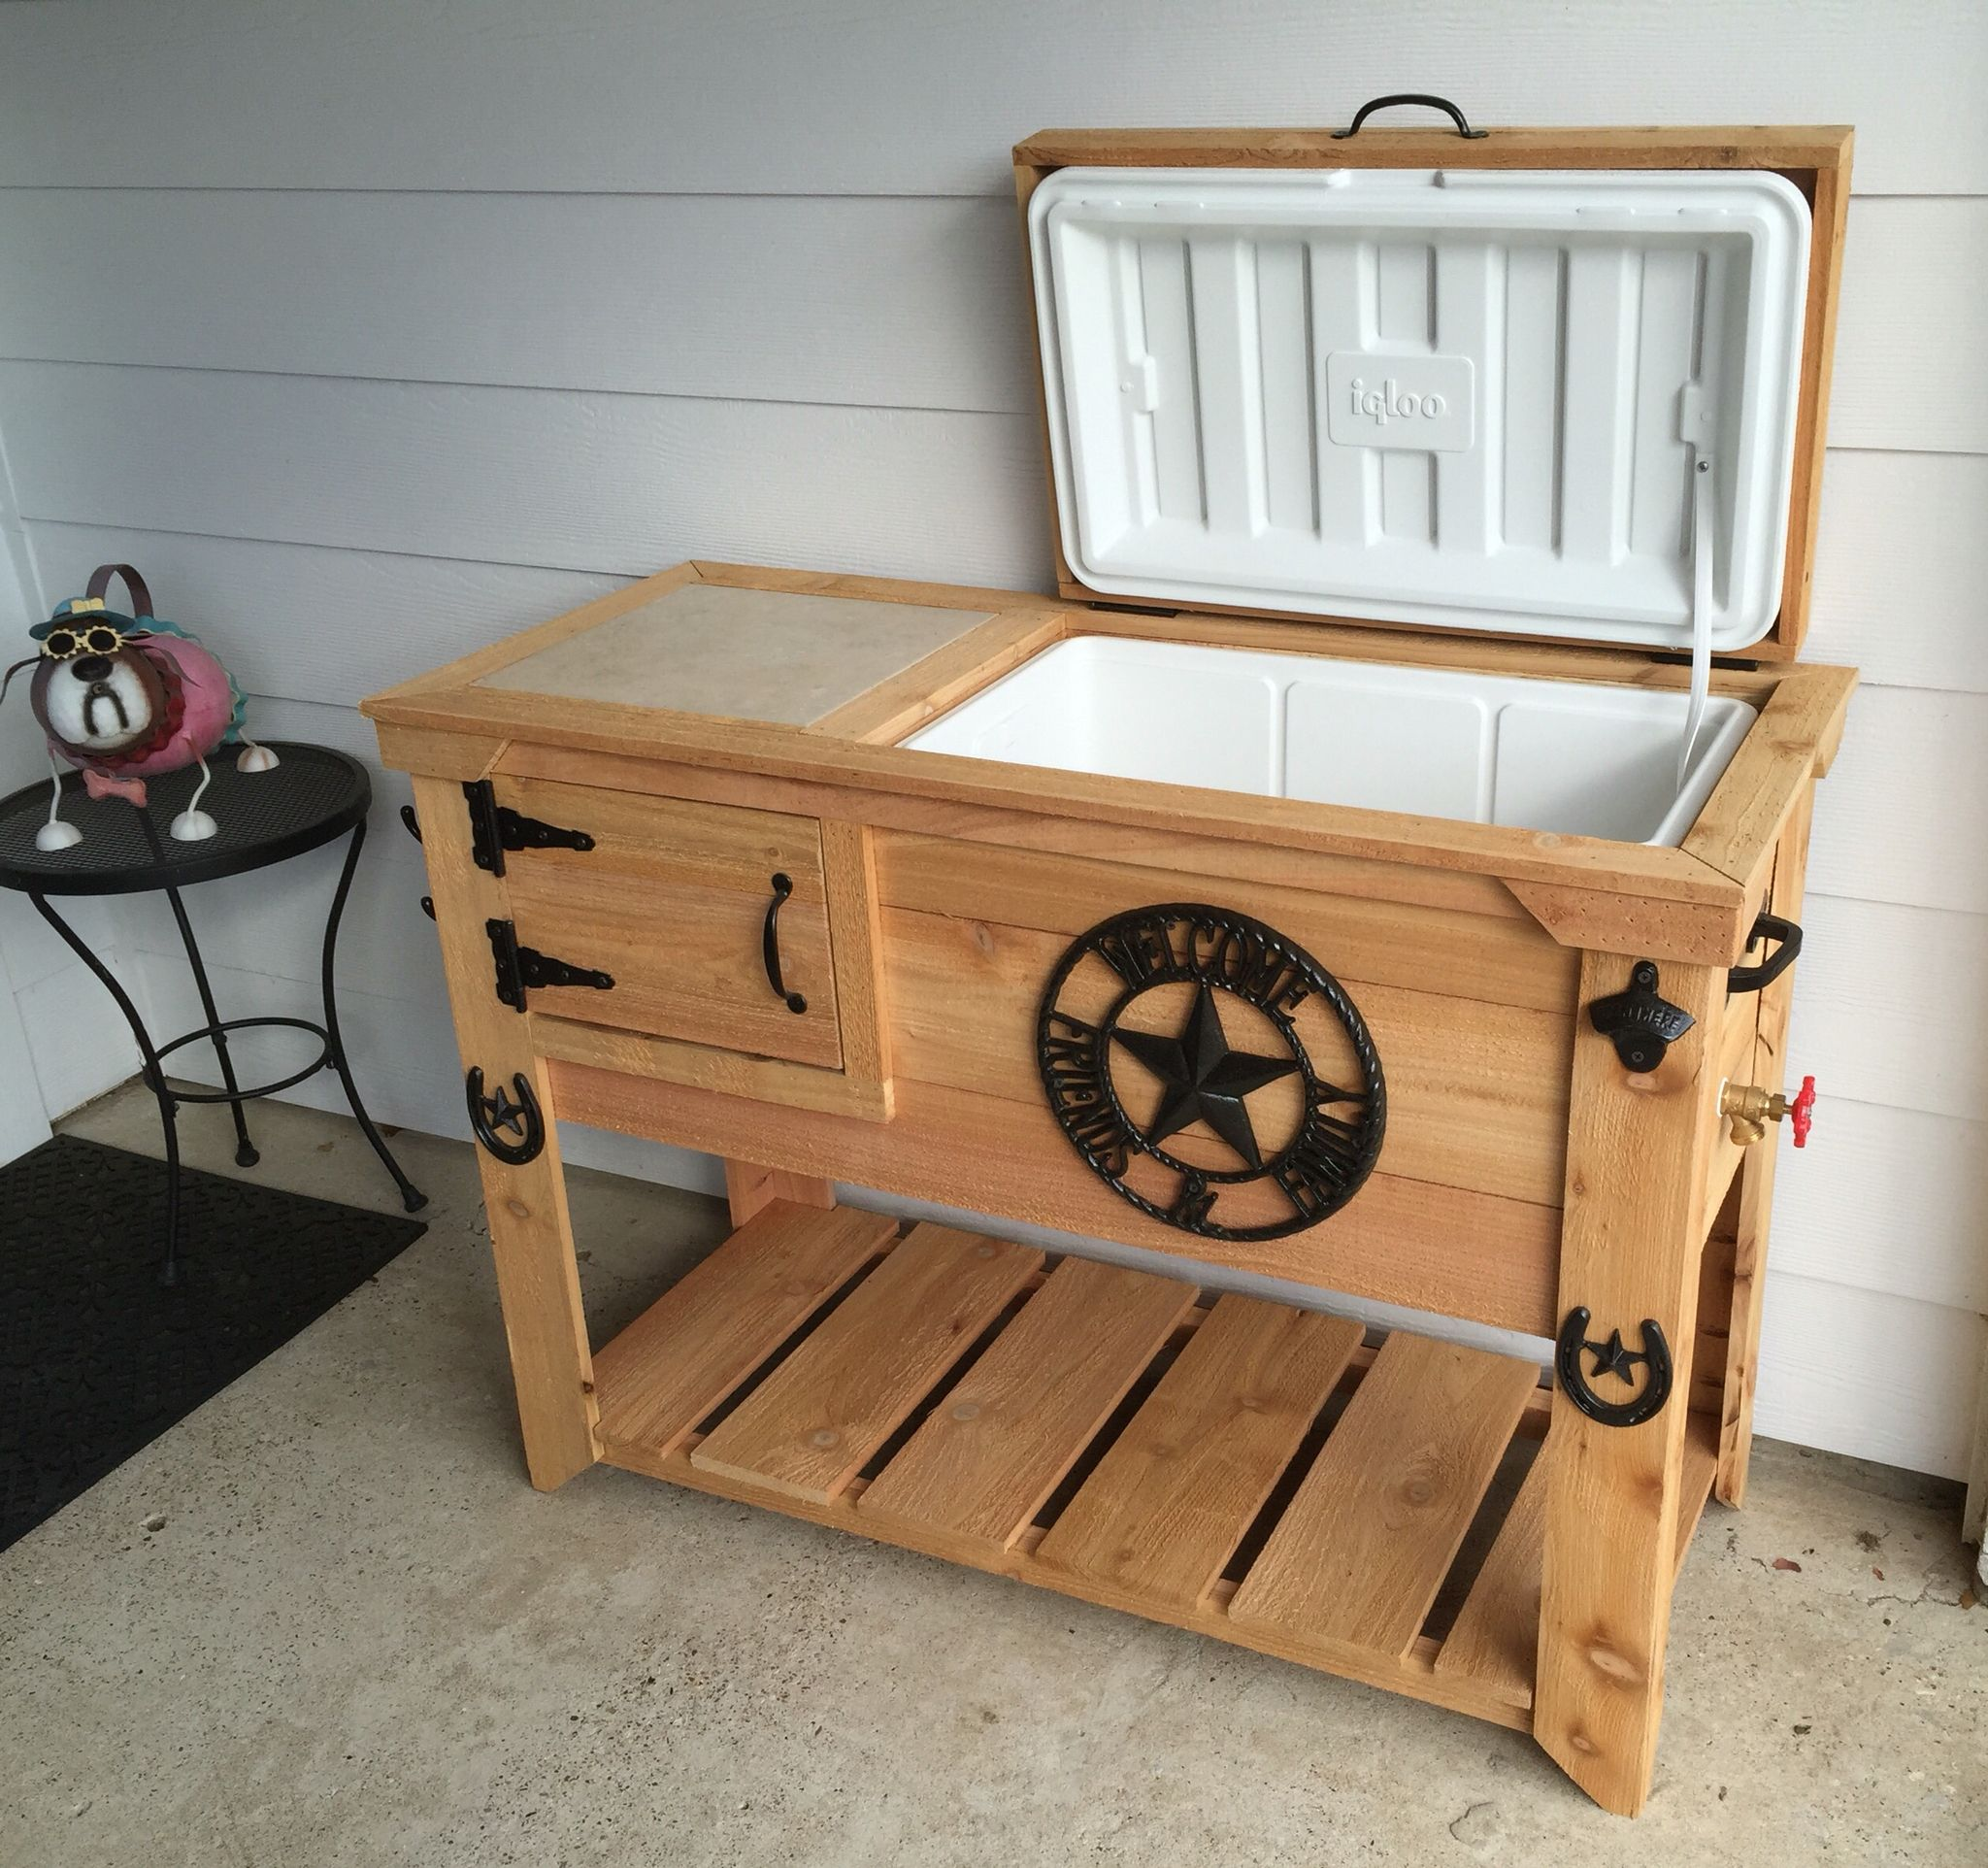 Wooden deck cooler plans trap door for extra storage under for Wooden beer cooler plans